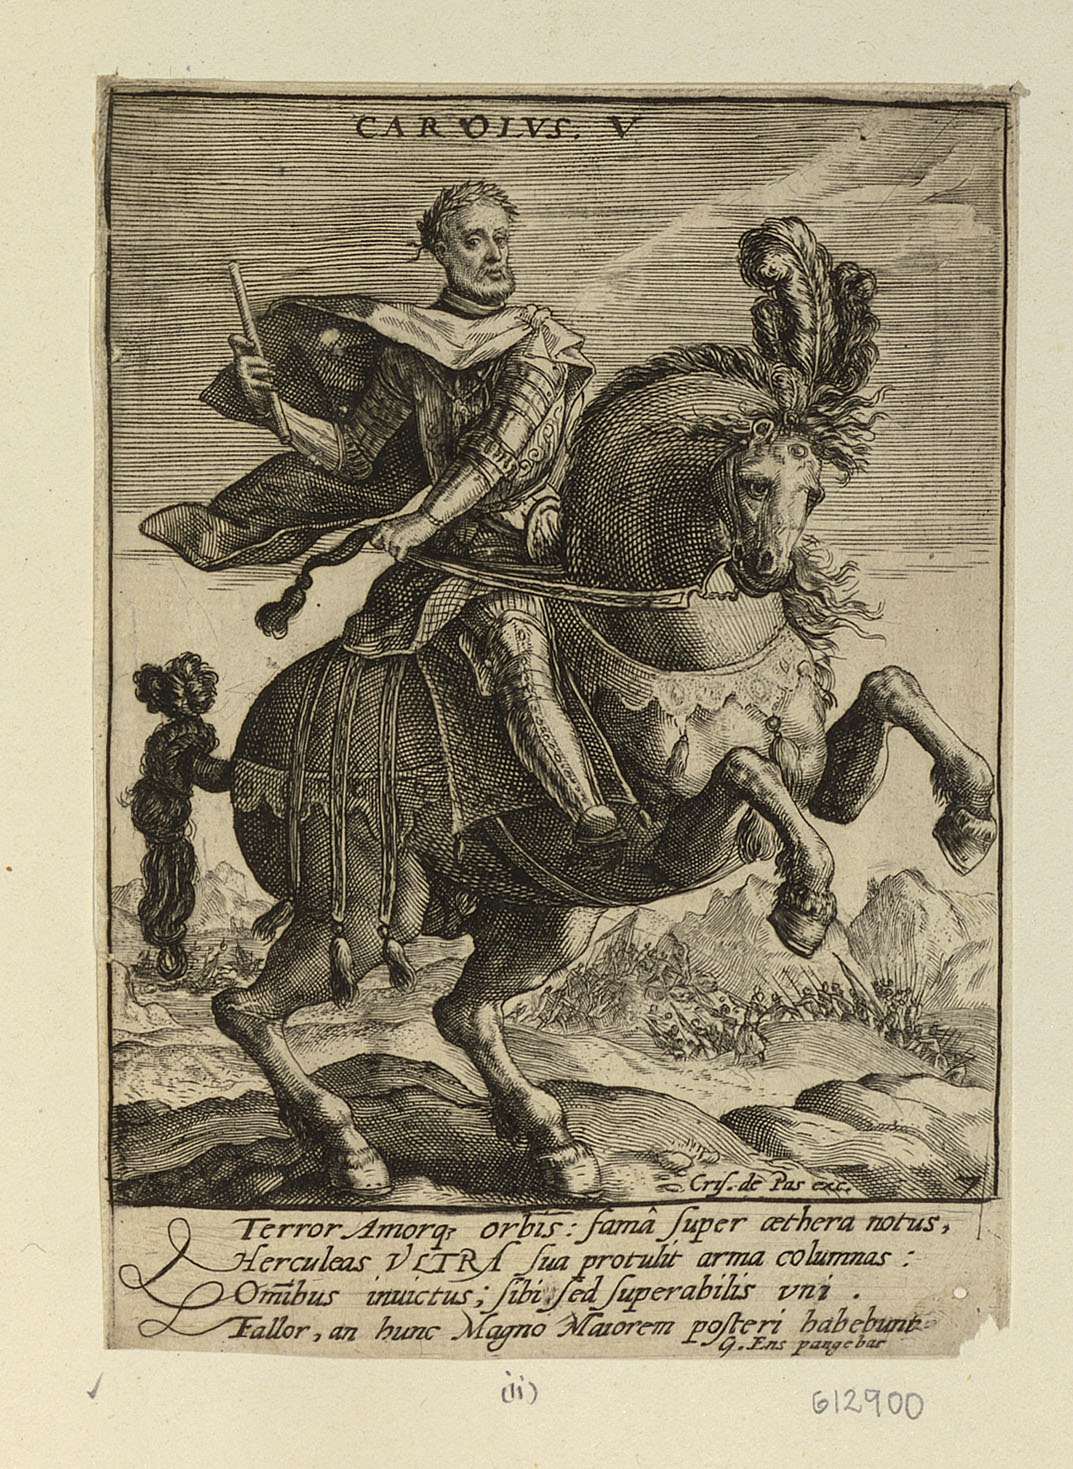 Charles V, Holy Roman Emperor, on Horseback, cr. 1579-1637, Crispijn van de Passe, Netherlands